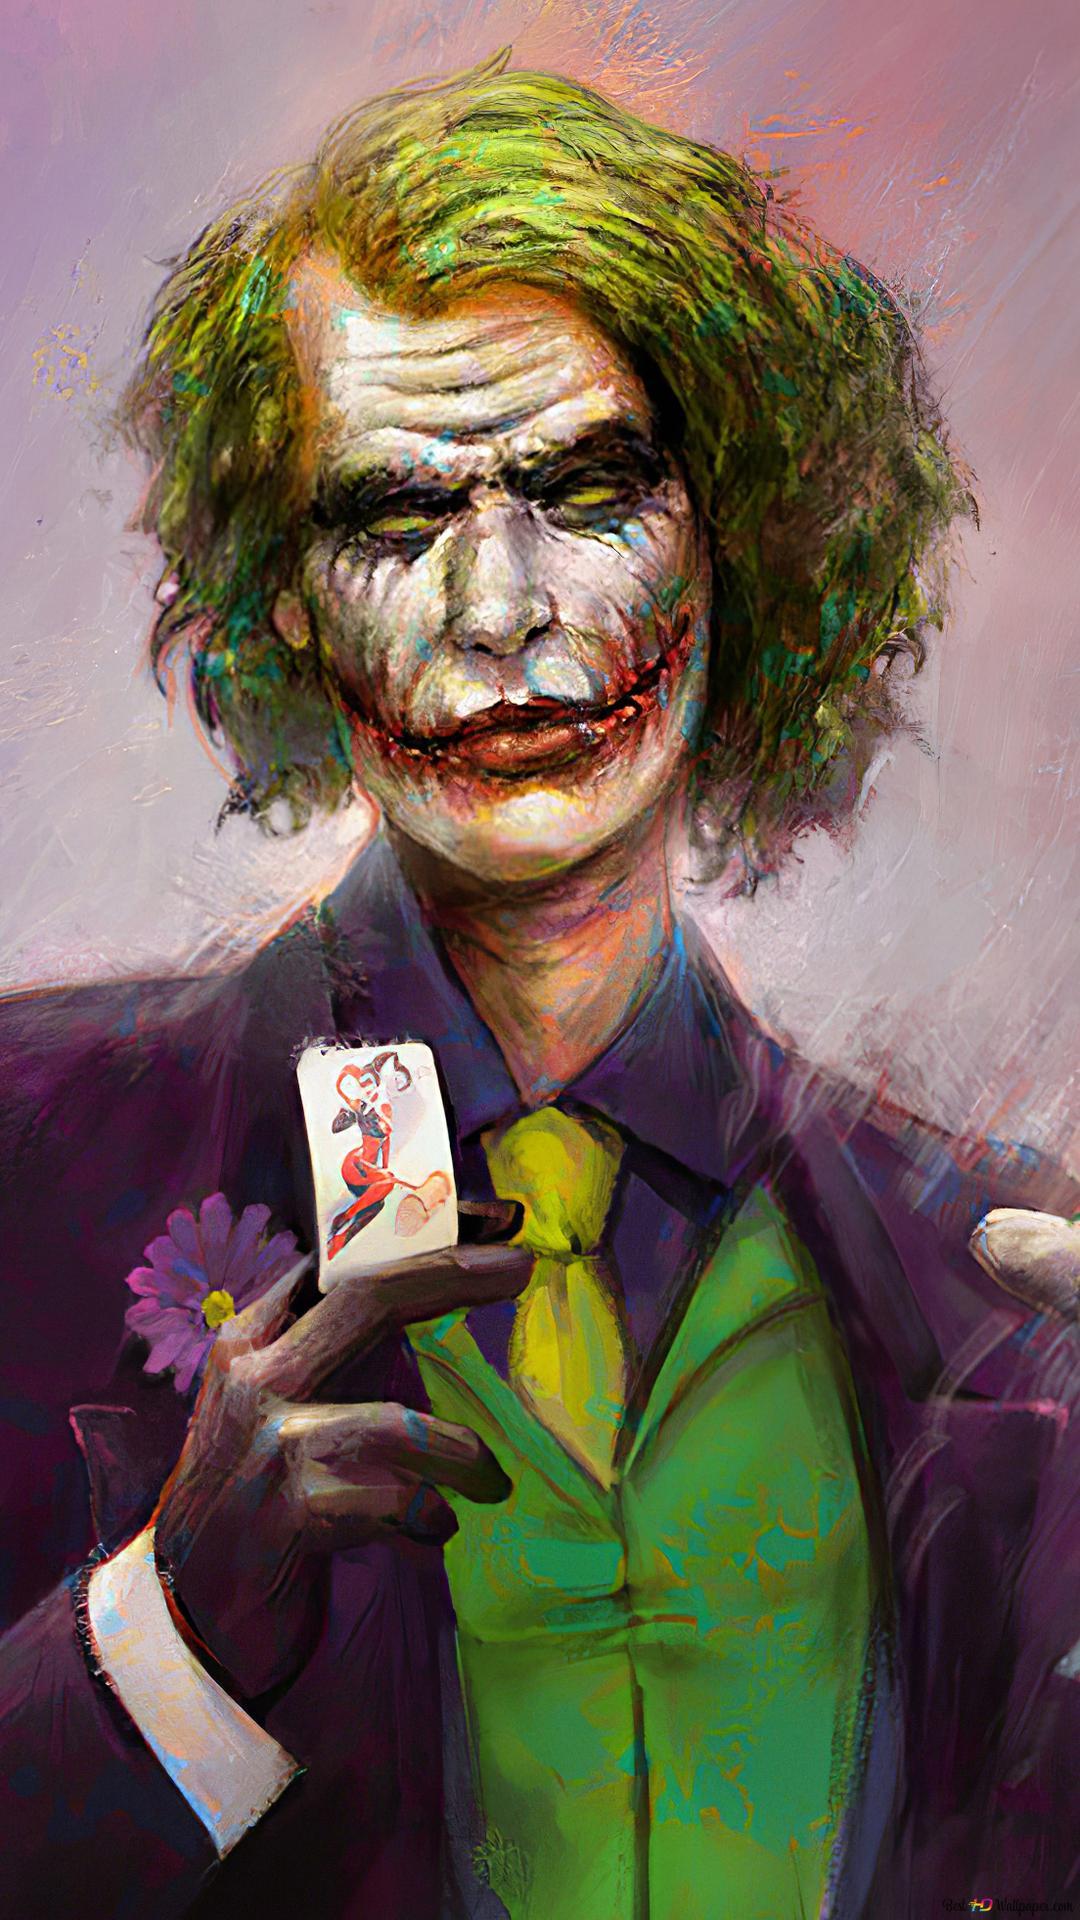 Joker And Batman Comic Hd Wallpaper Download